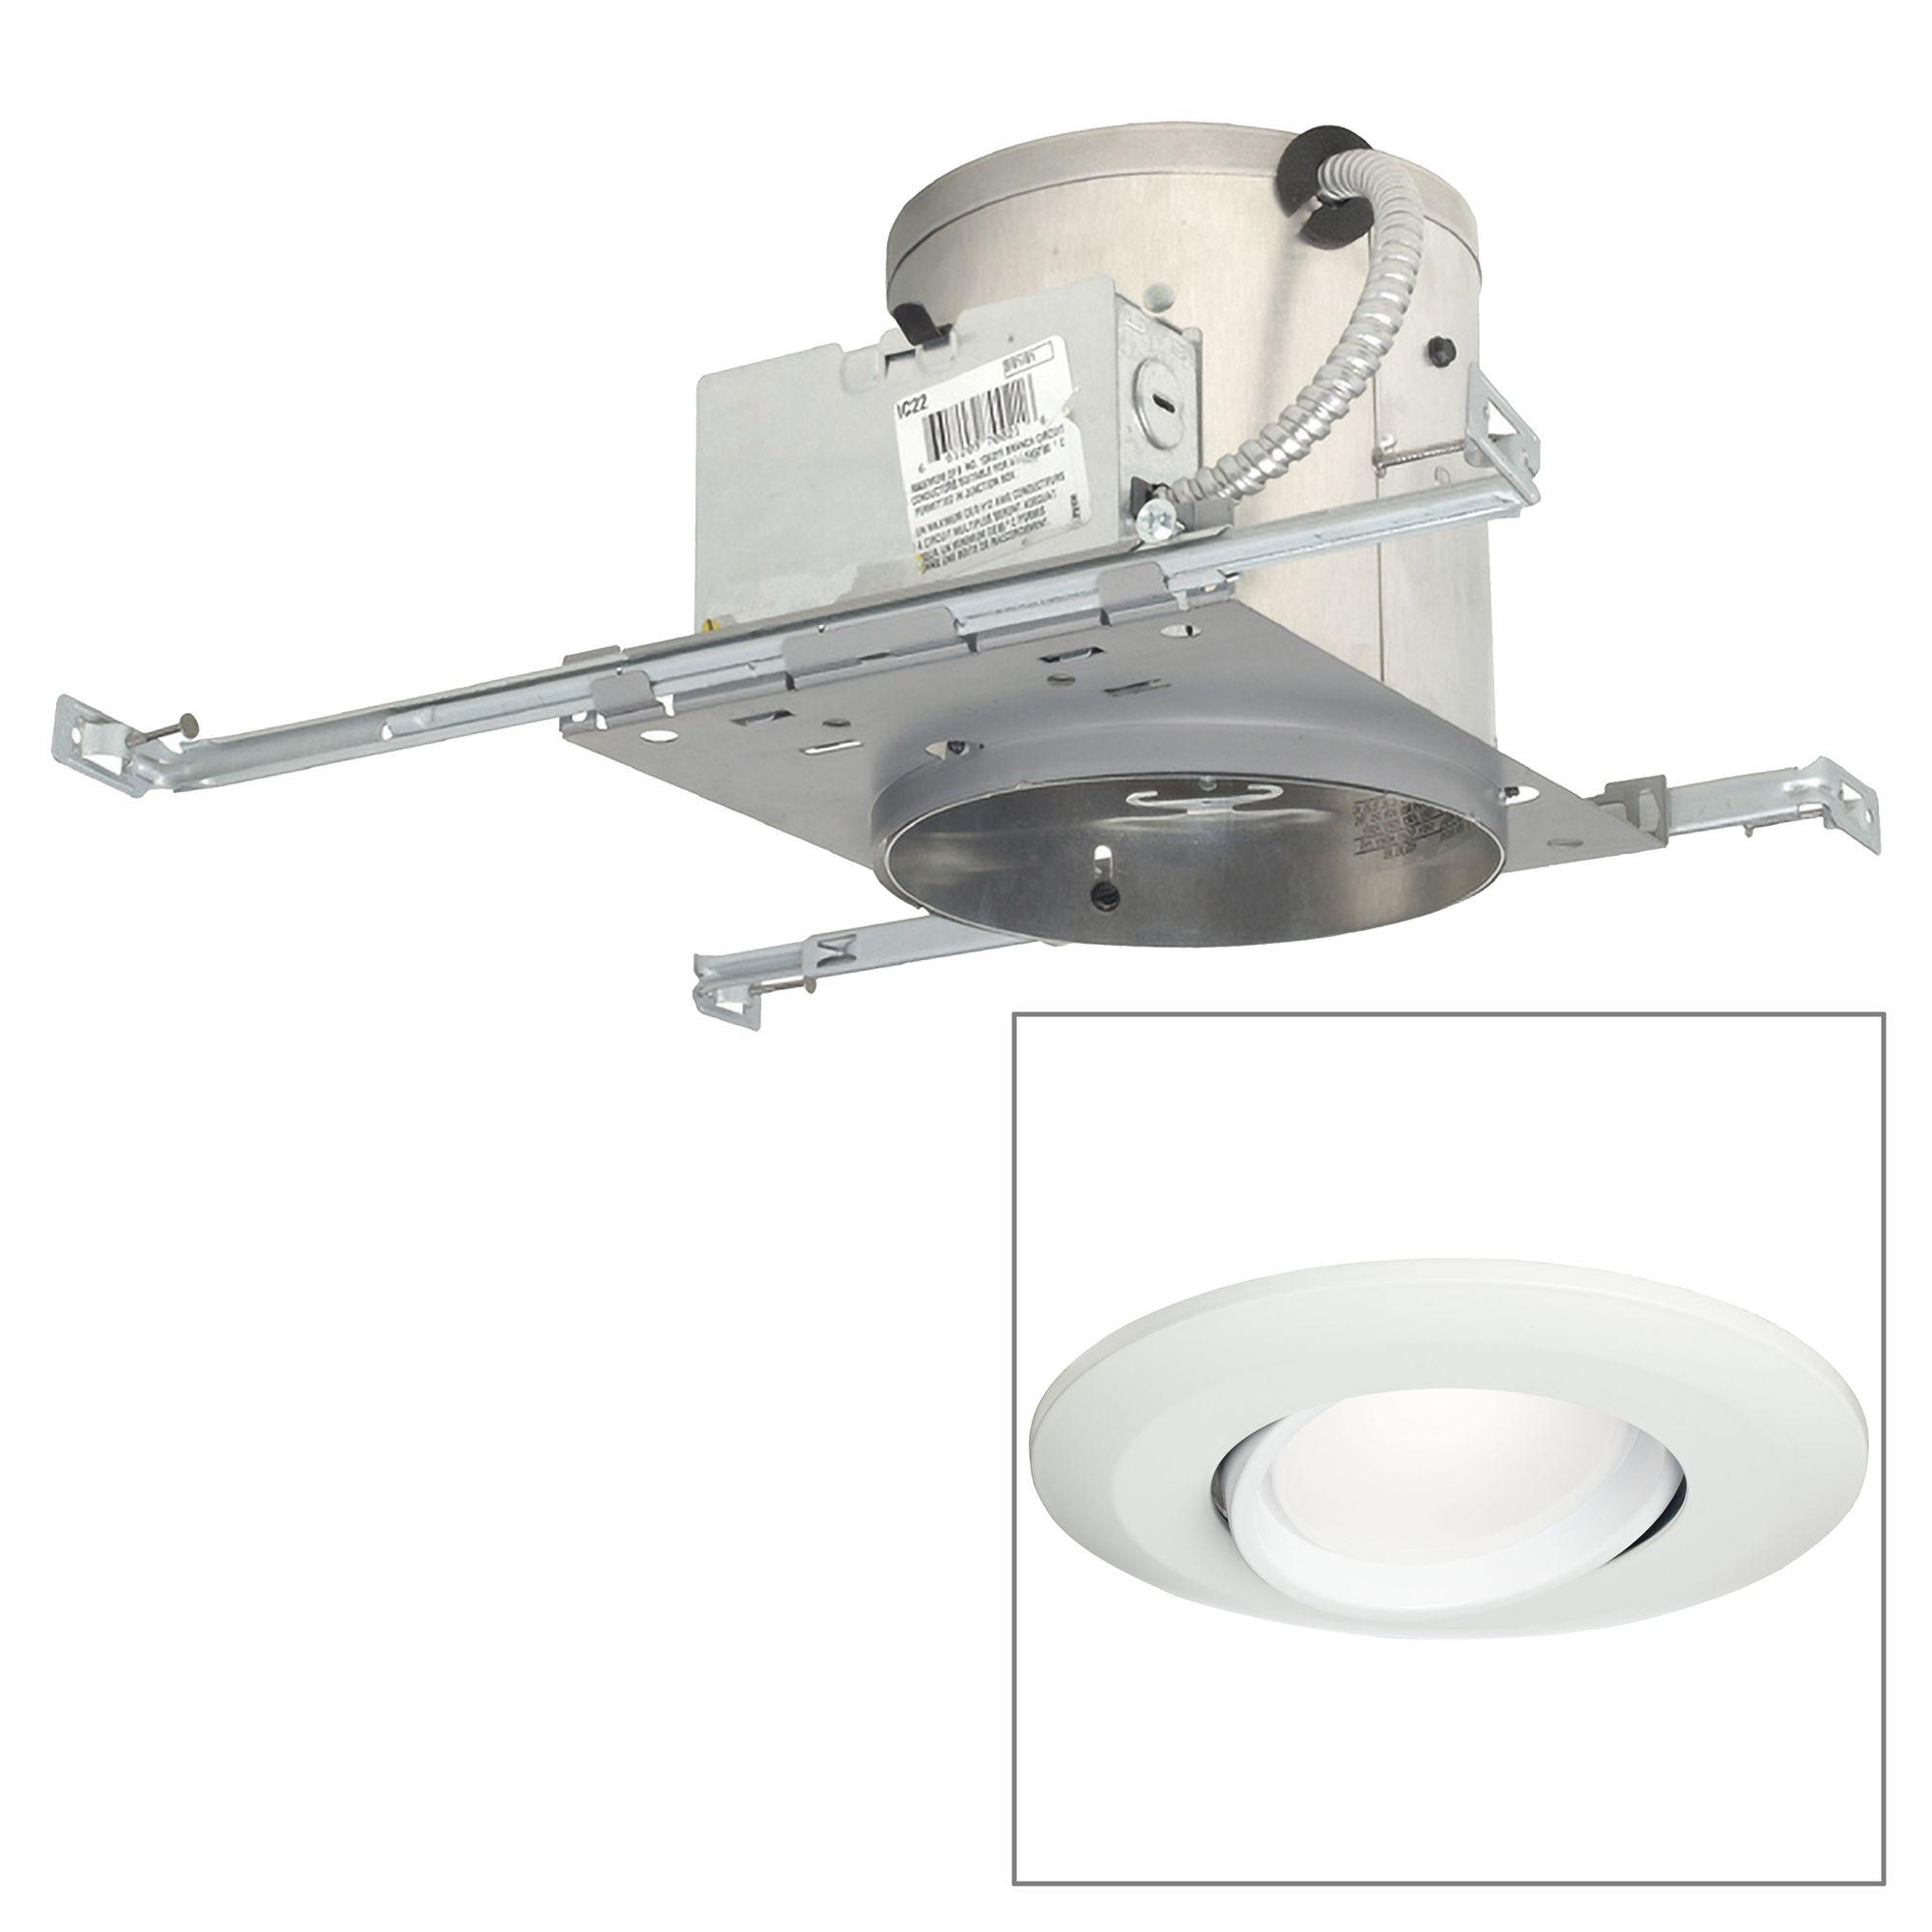 6 ic new construction 15w led eyeball recessed light kit